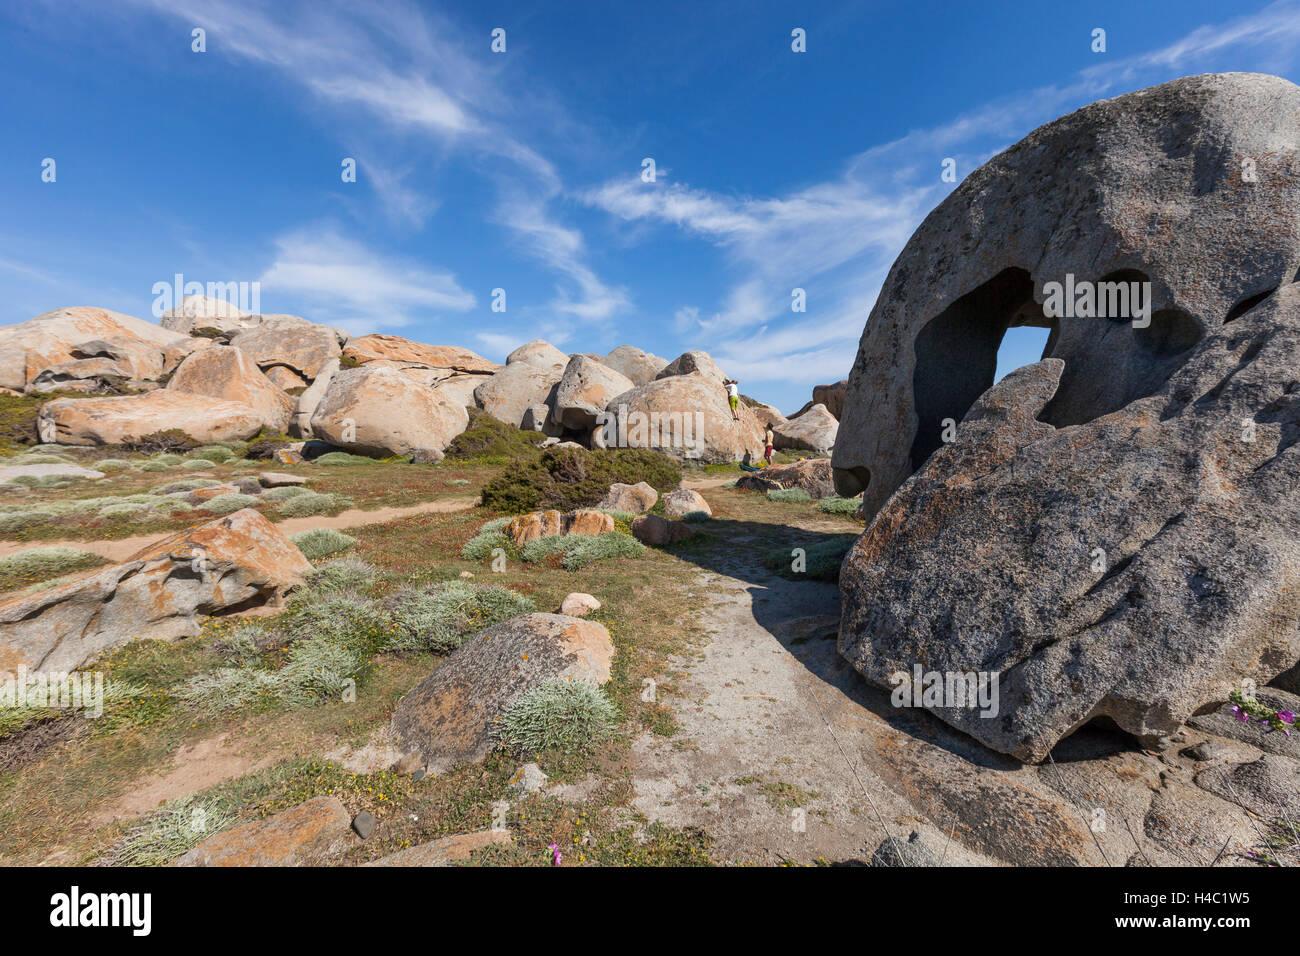 Europa, Francia, Córcega, trepar rocas en Capineru Imagen De Stock